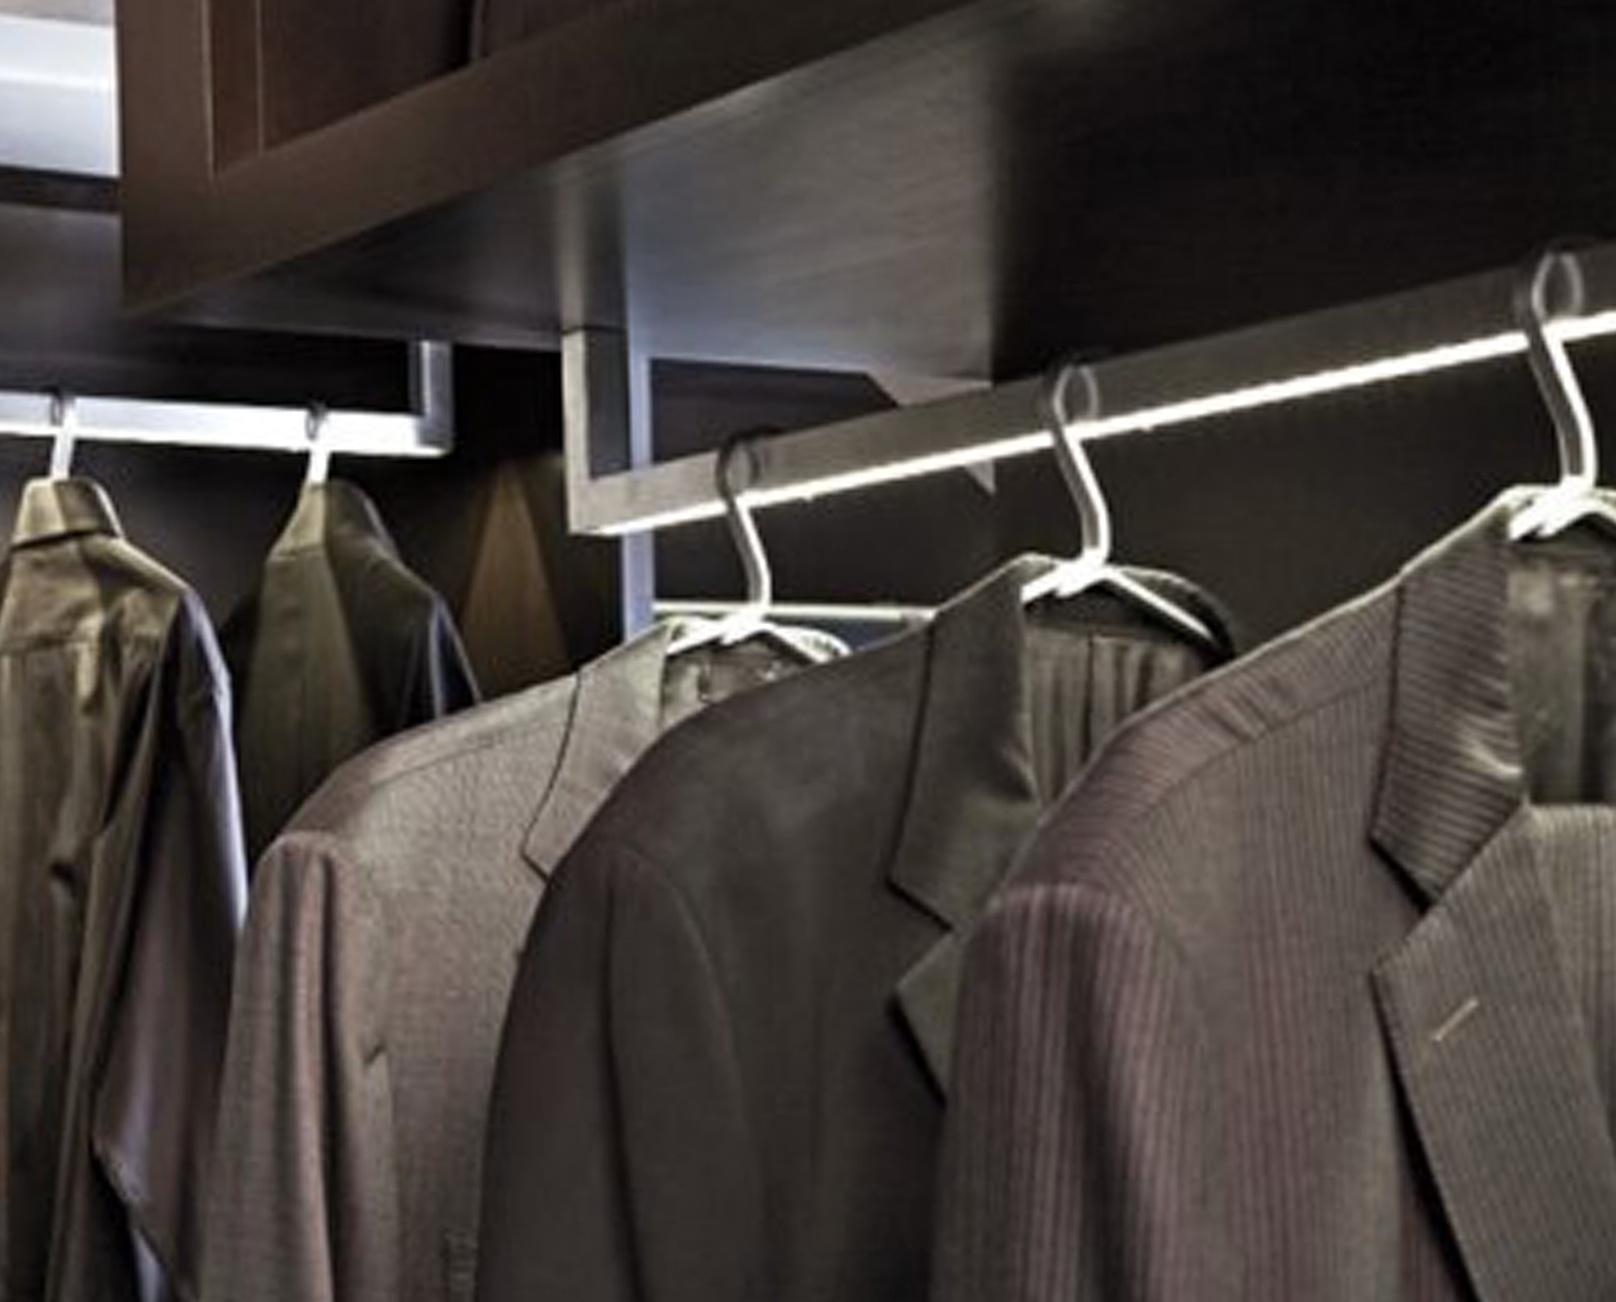 Lighted Closet Rods   Closet Ideas